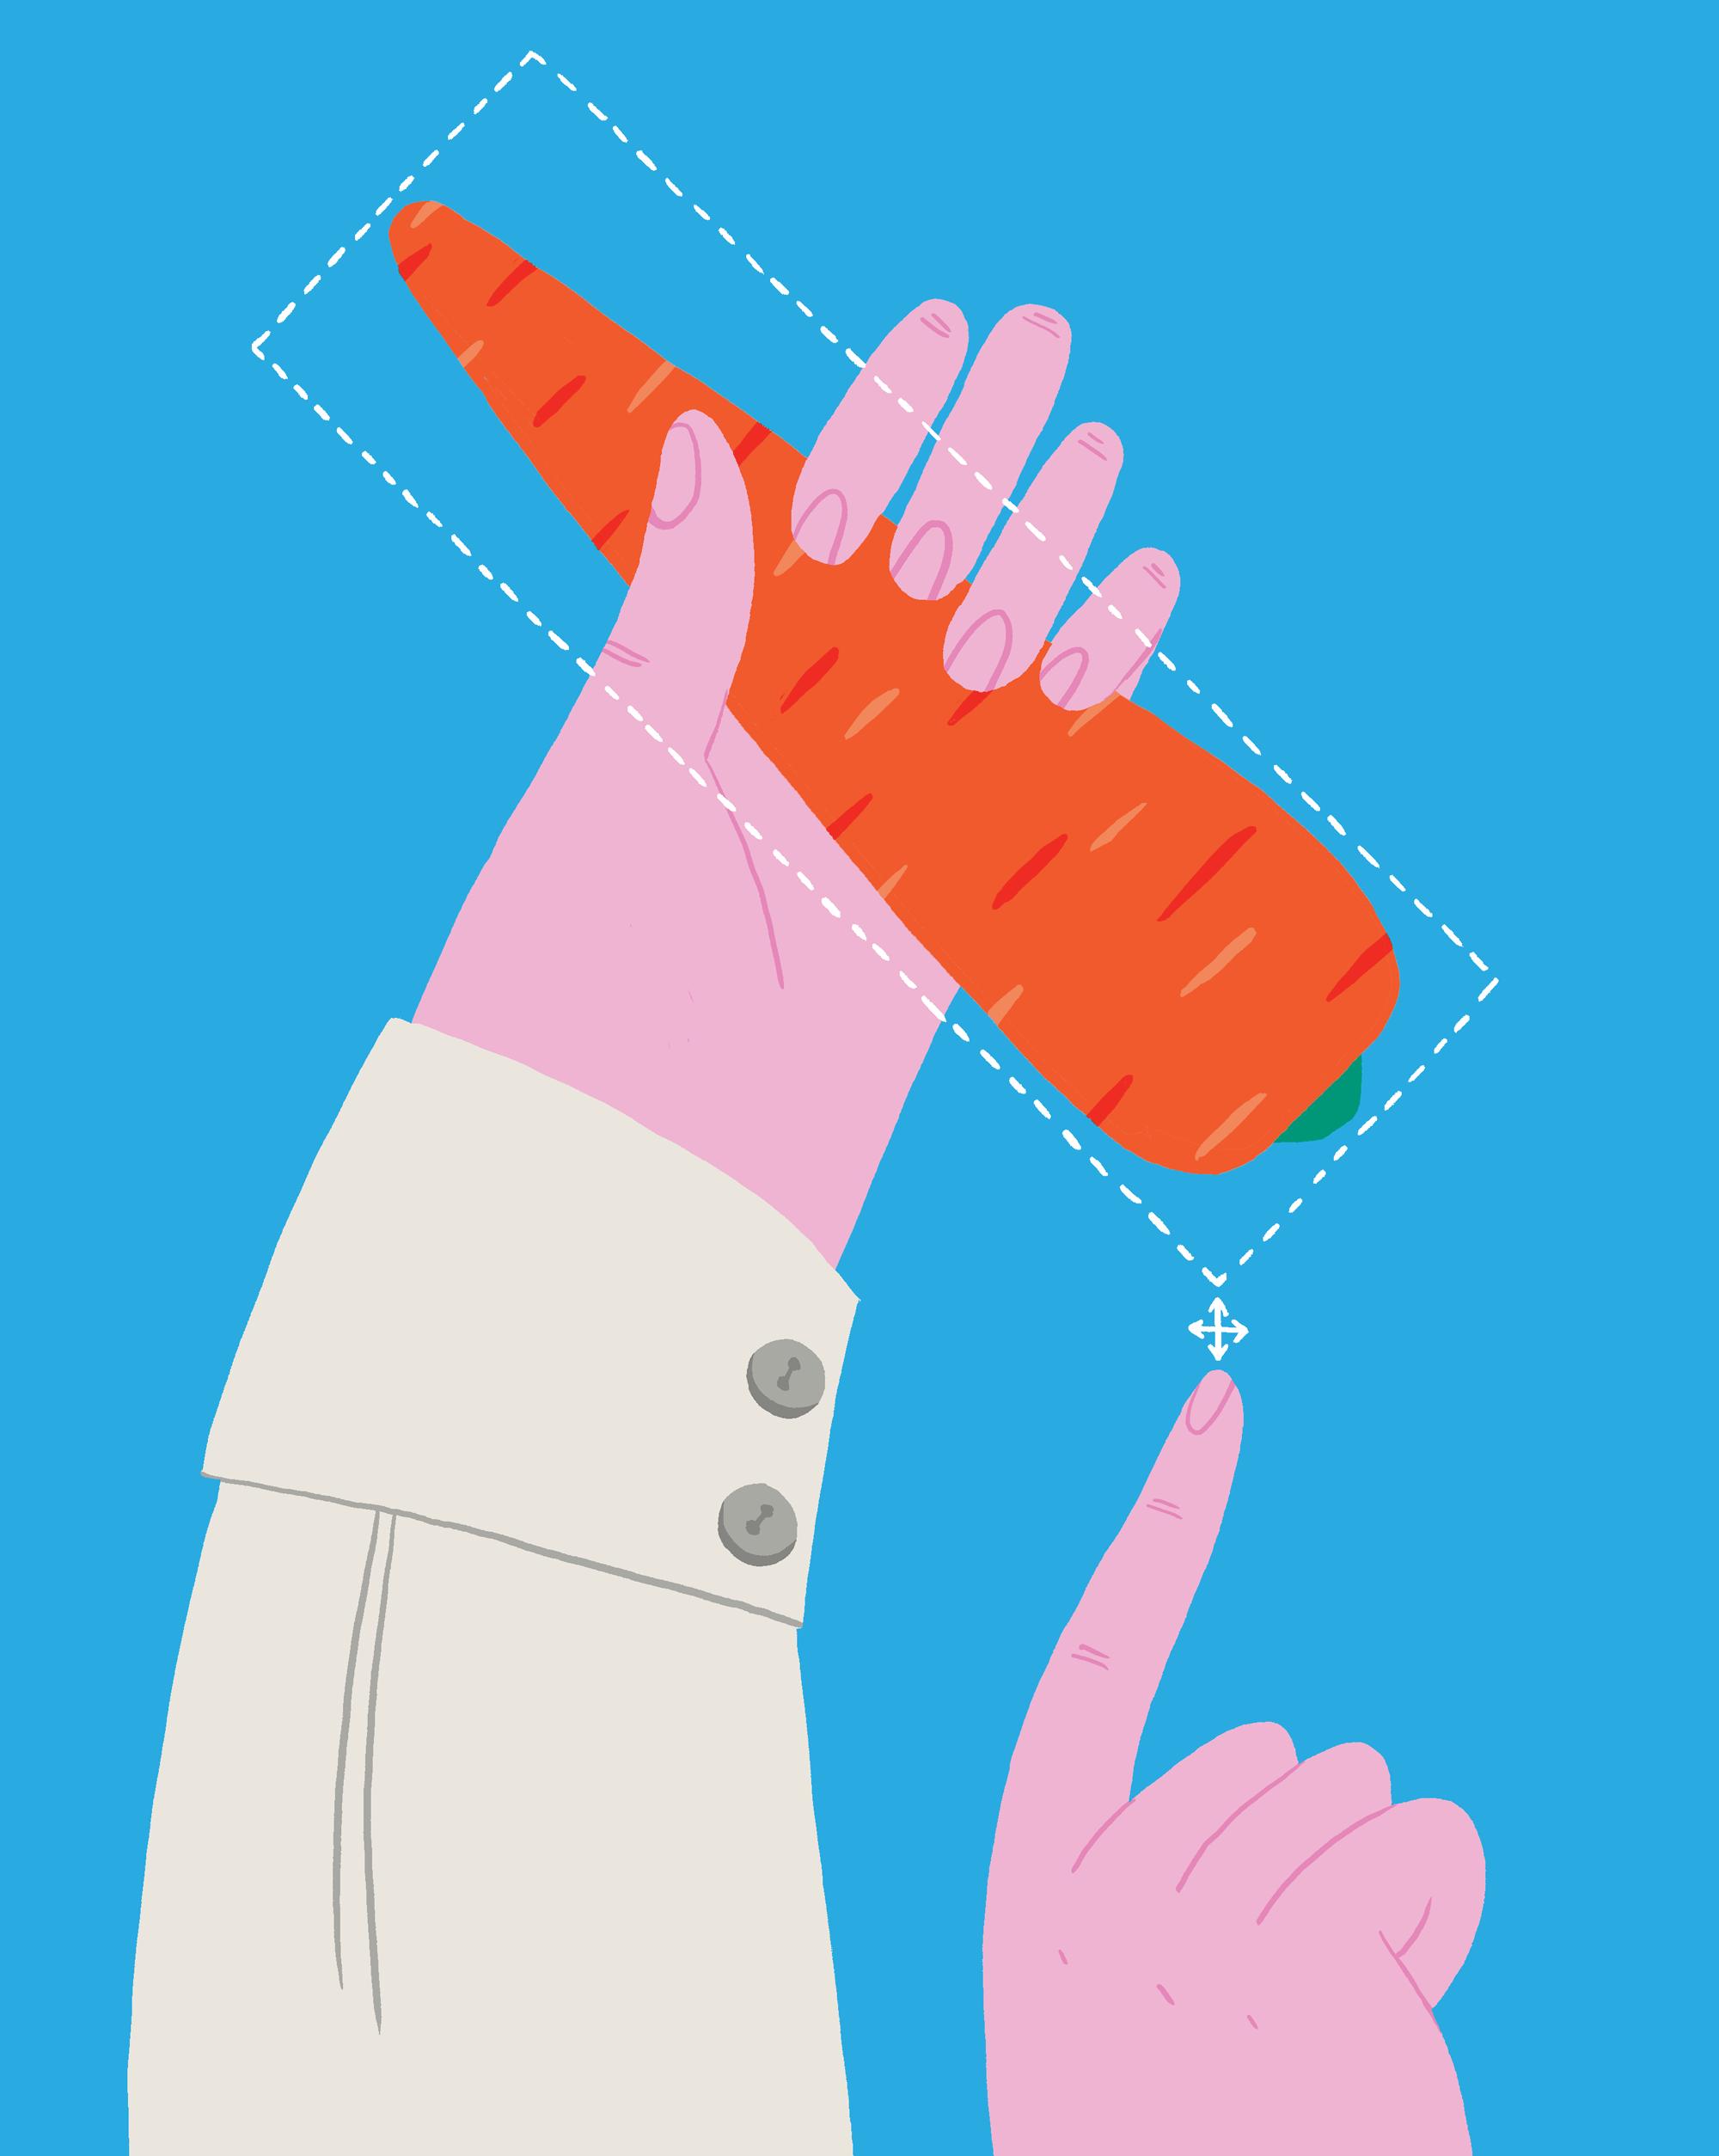 pf-porkkana